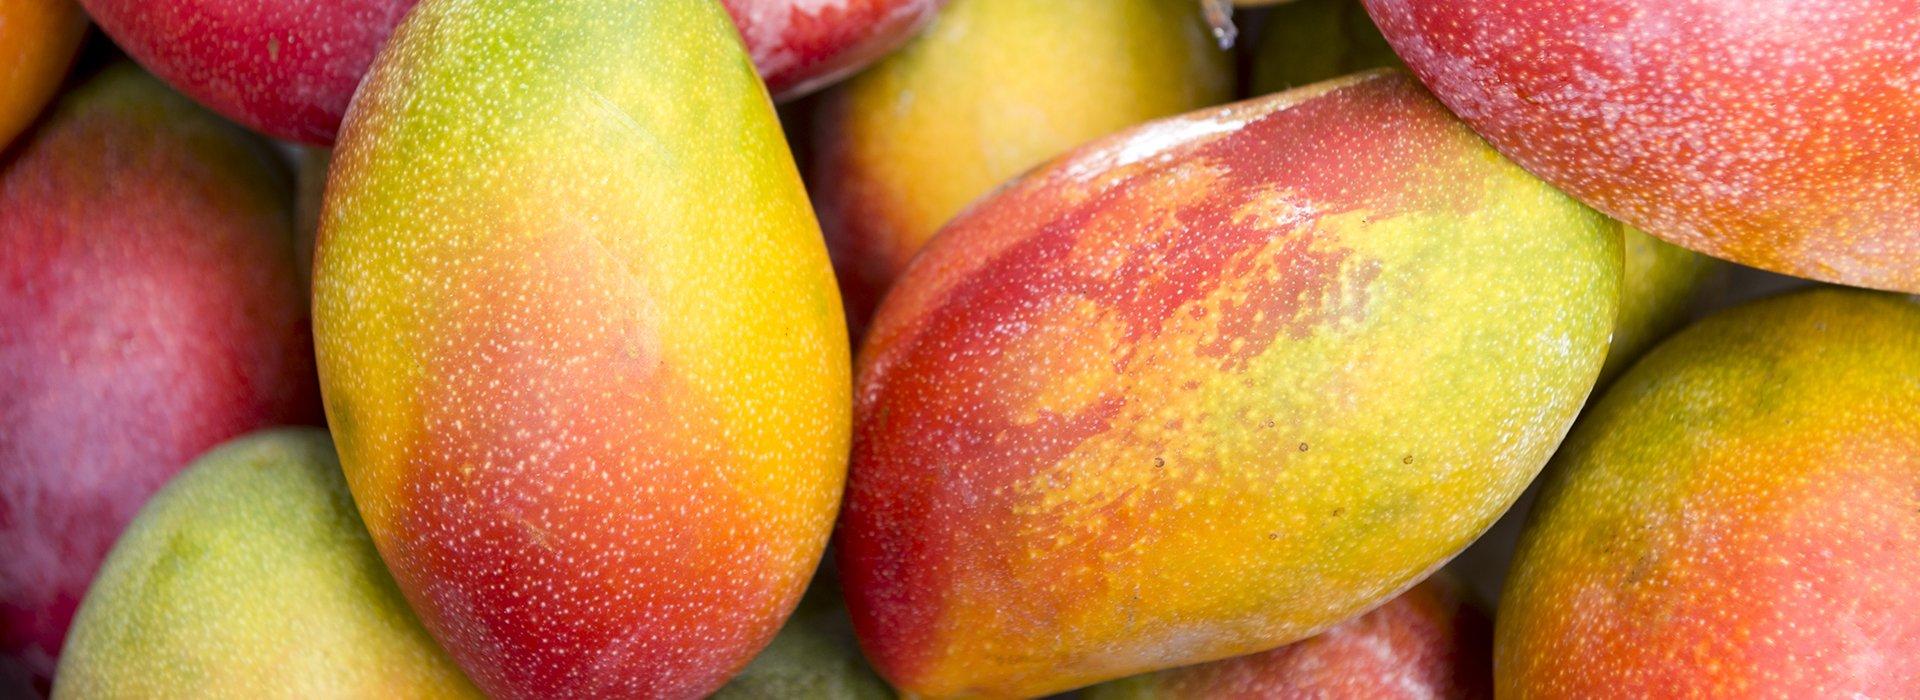 Immagine dei manghi